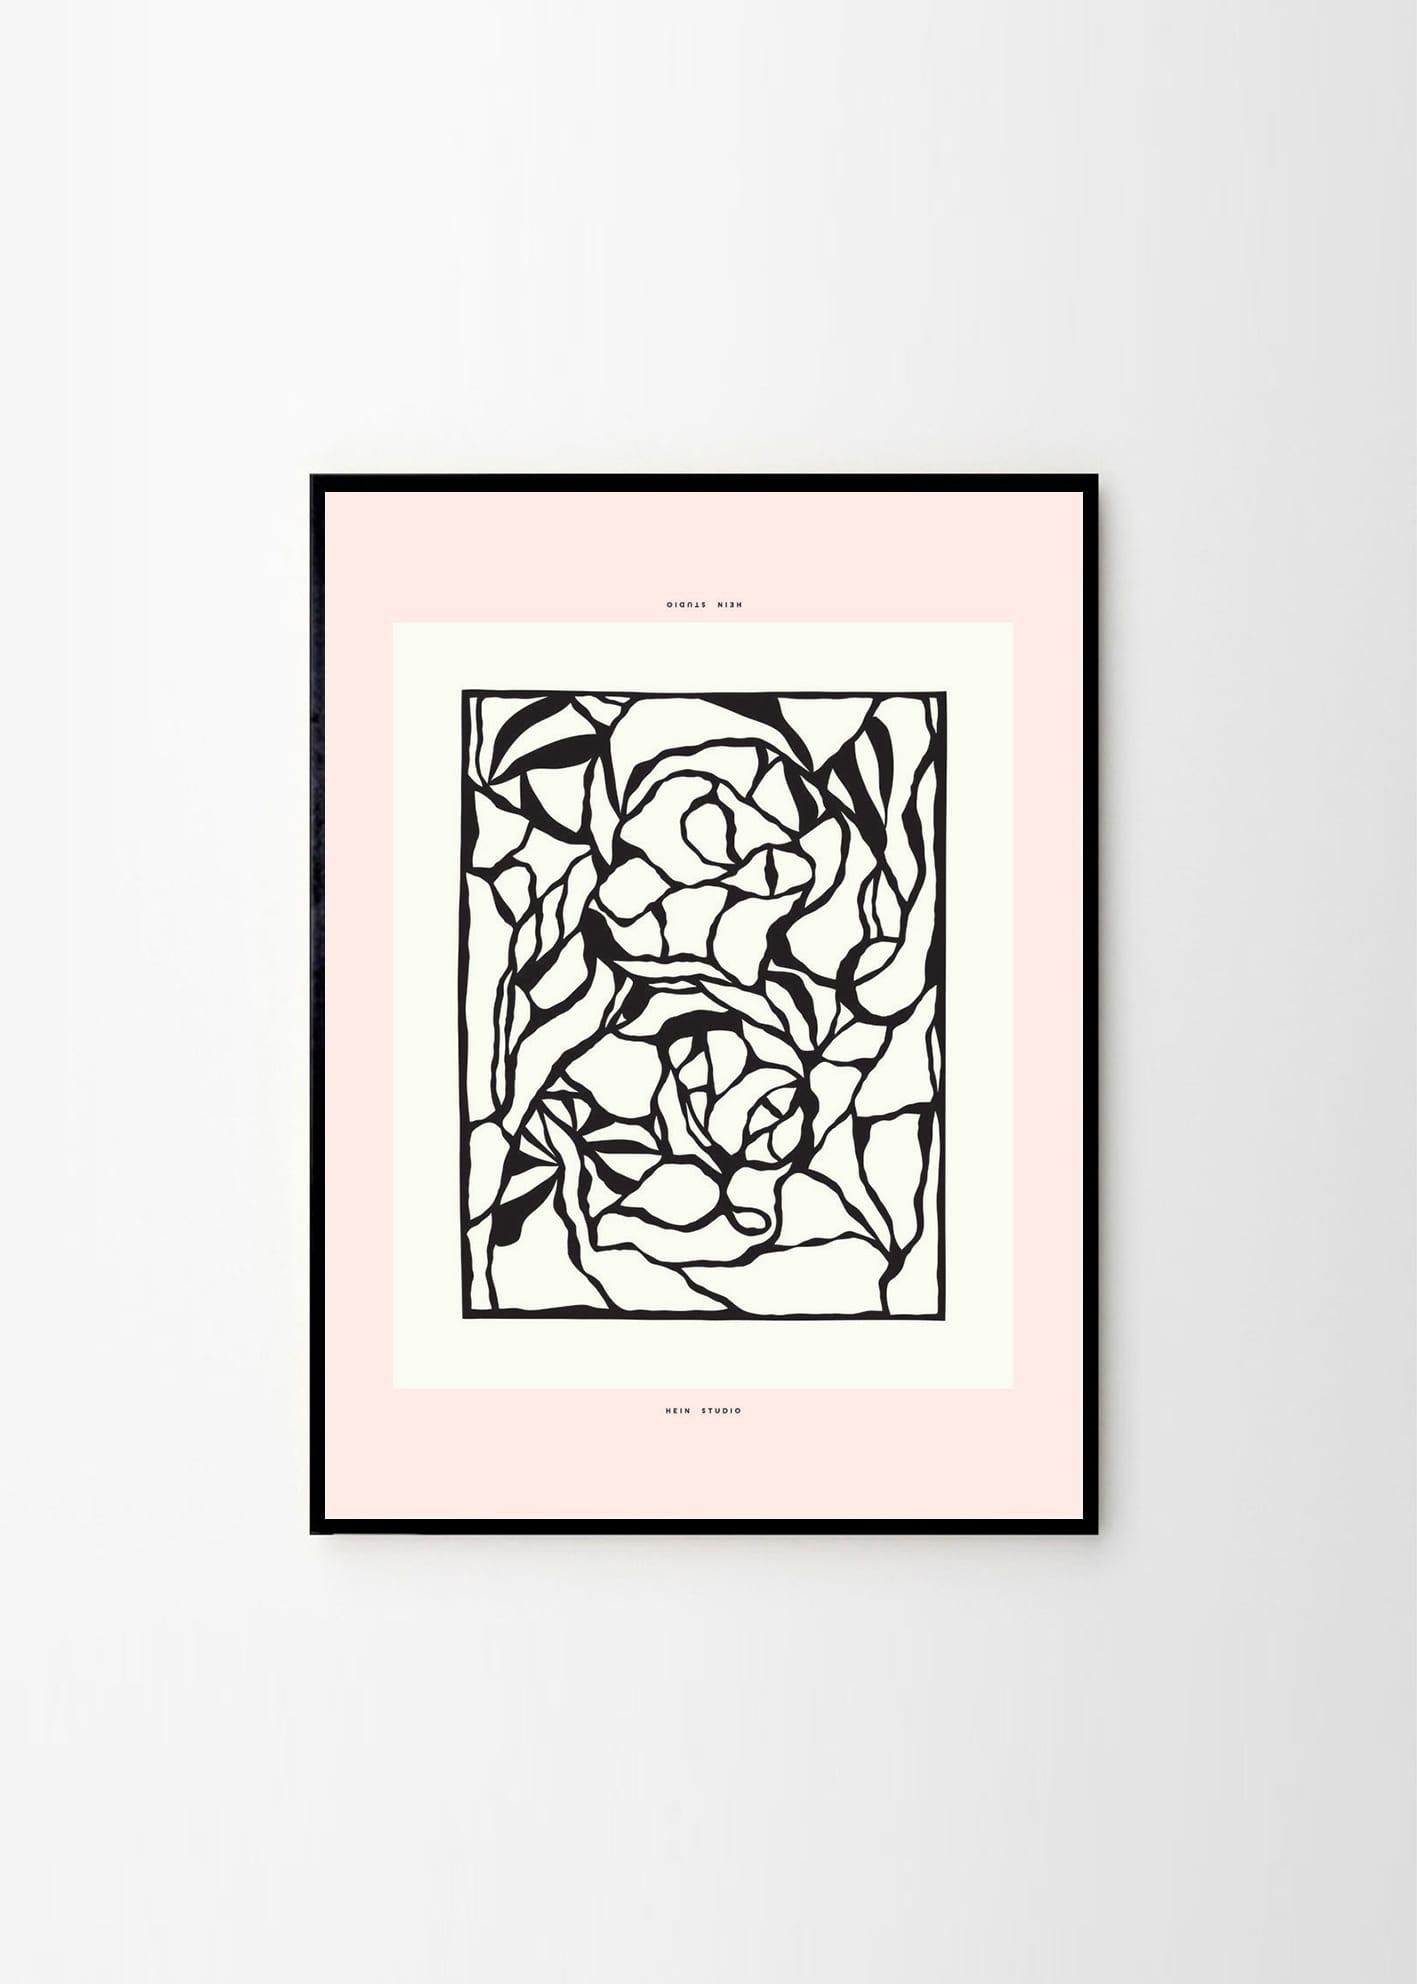 Hein Studio - I see you (Pale/Pink)